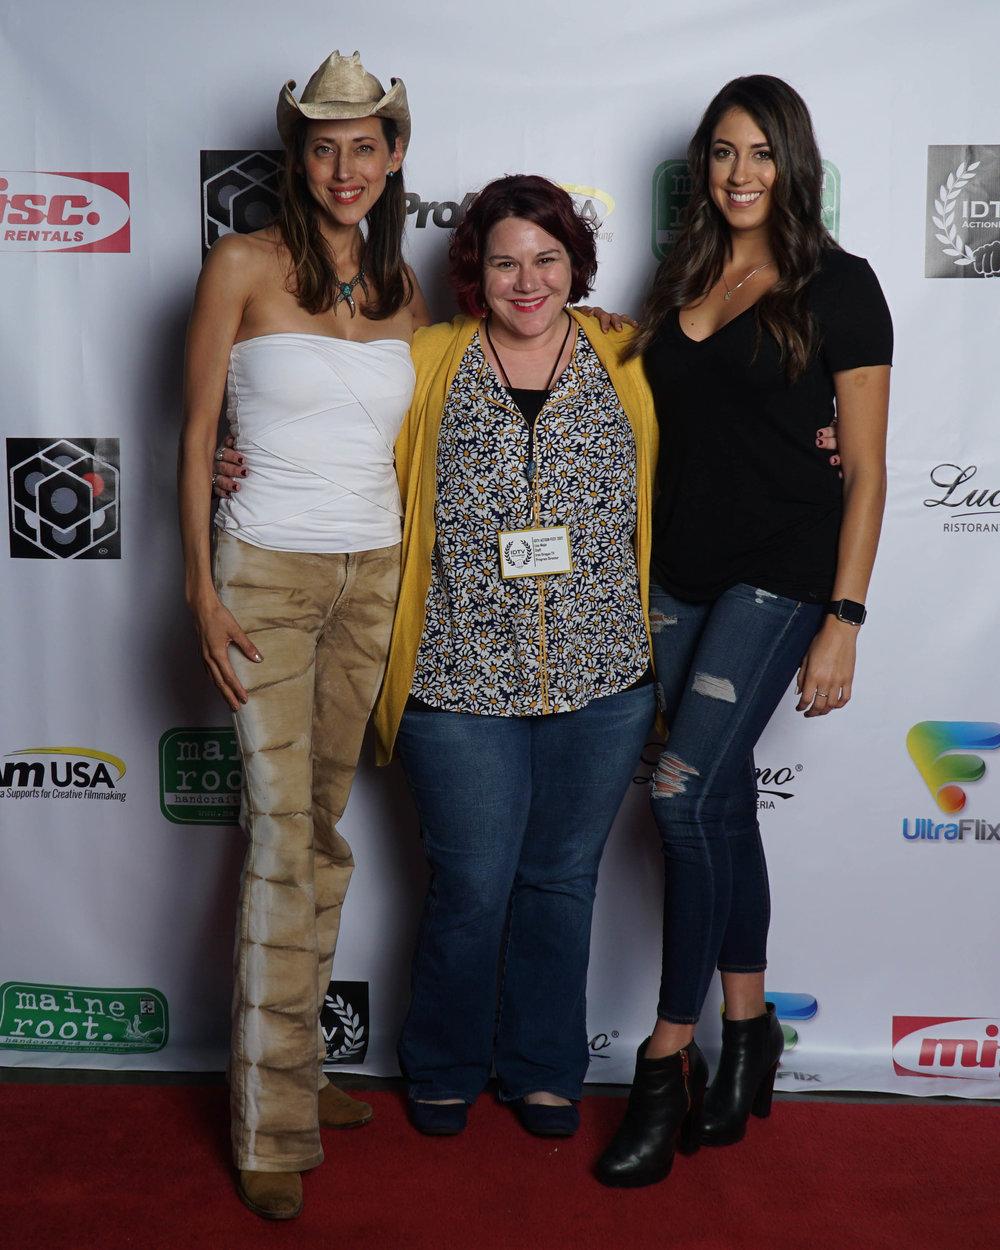 Patricia Vonne, Lisa Mejia, and Caitlin Dechelle